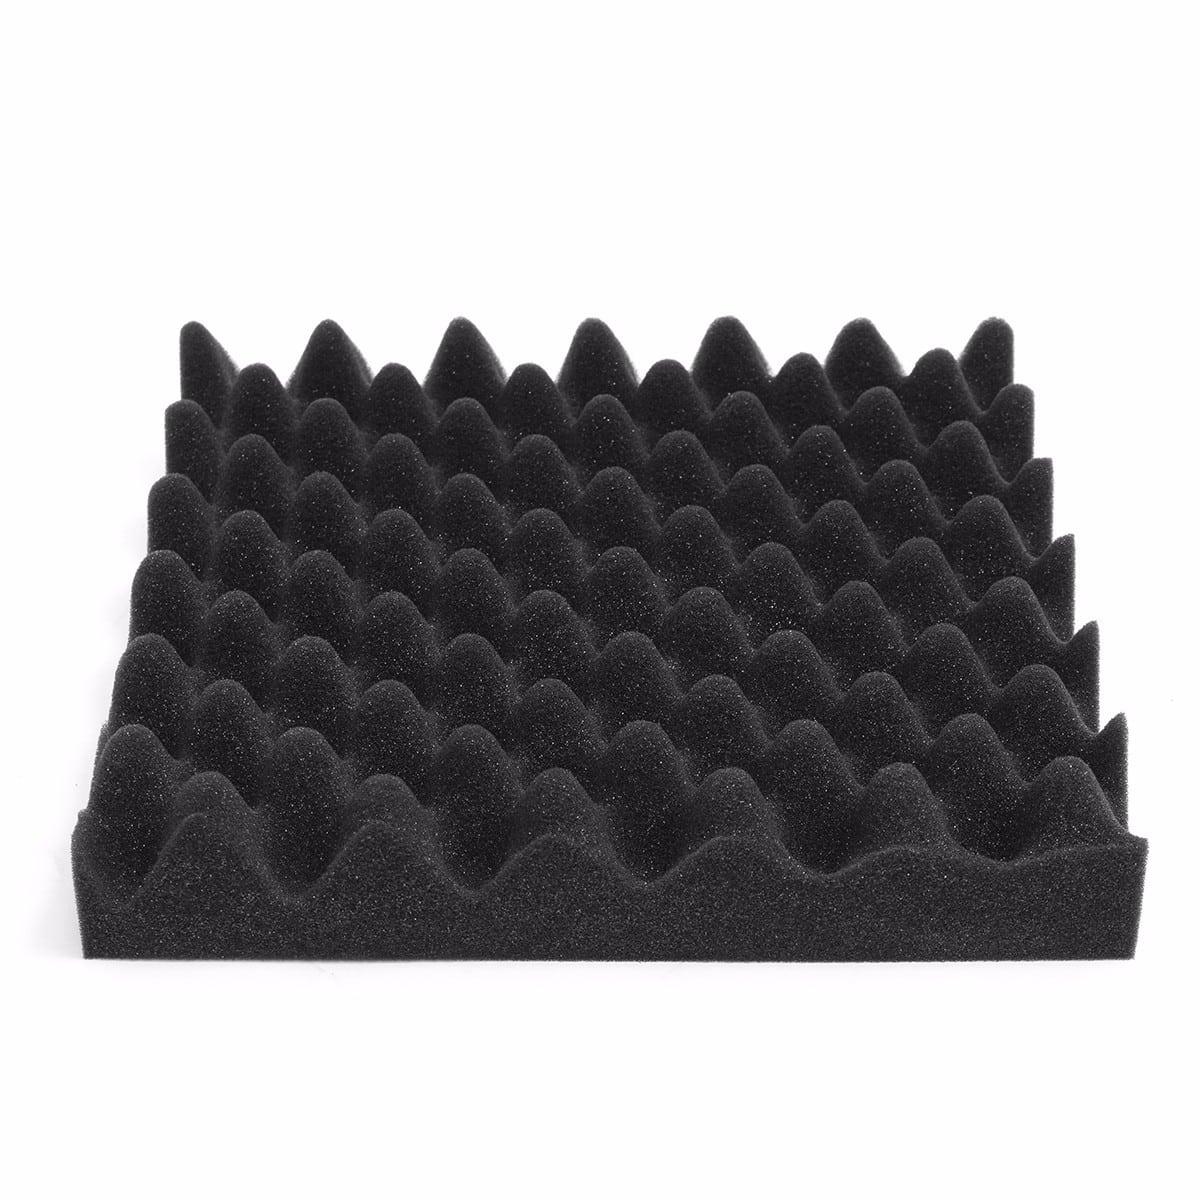 Acoustic Foam Panel